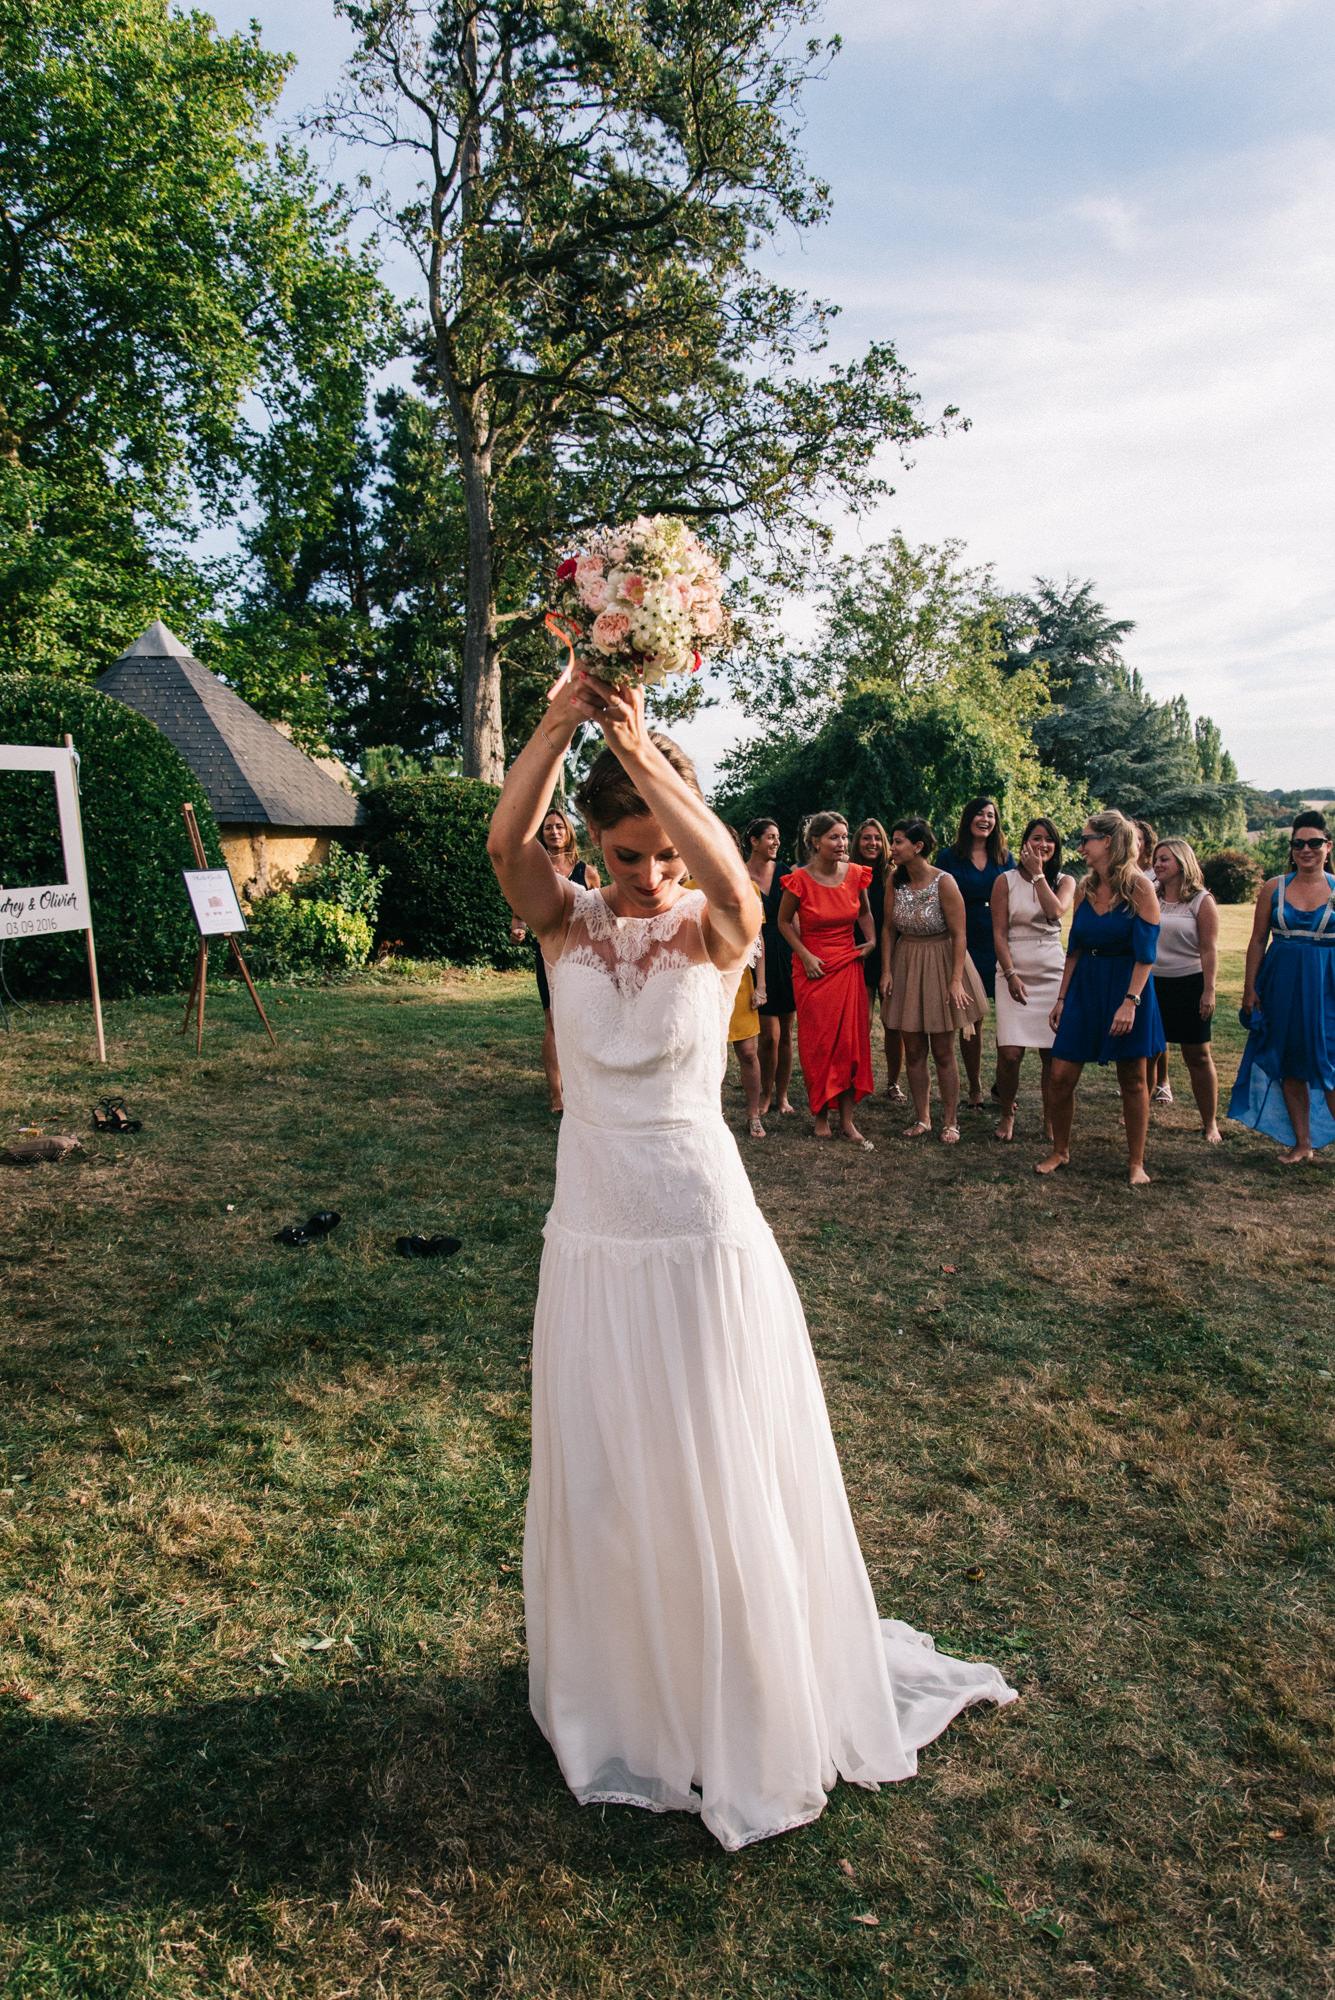 photographe-mariage-paris-nantes-provence-angers-44